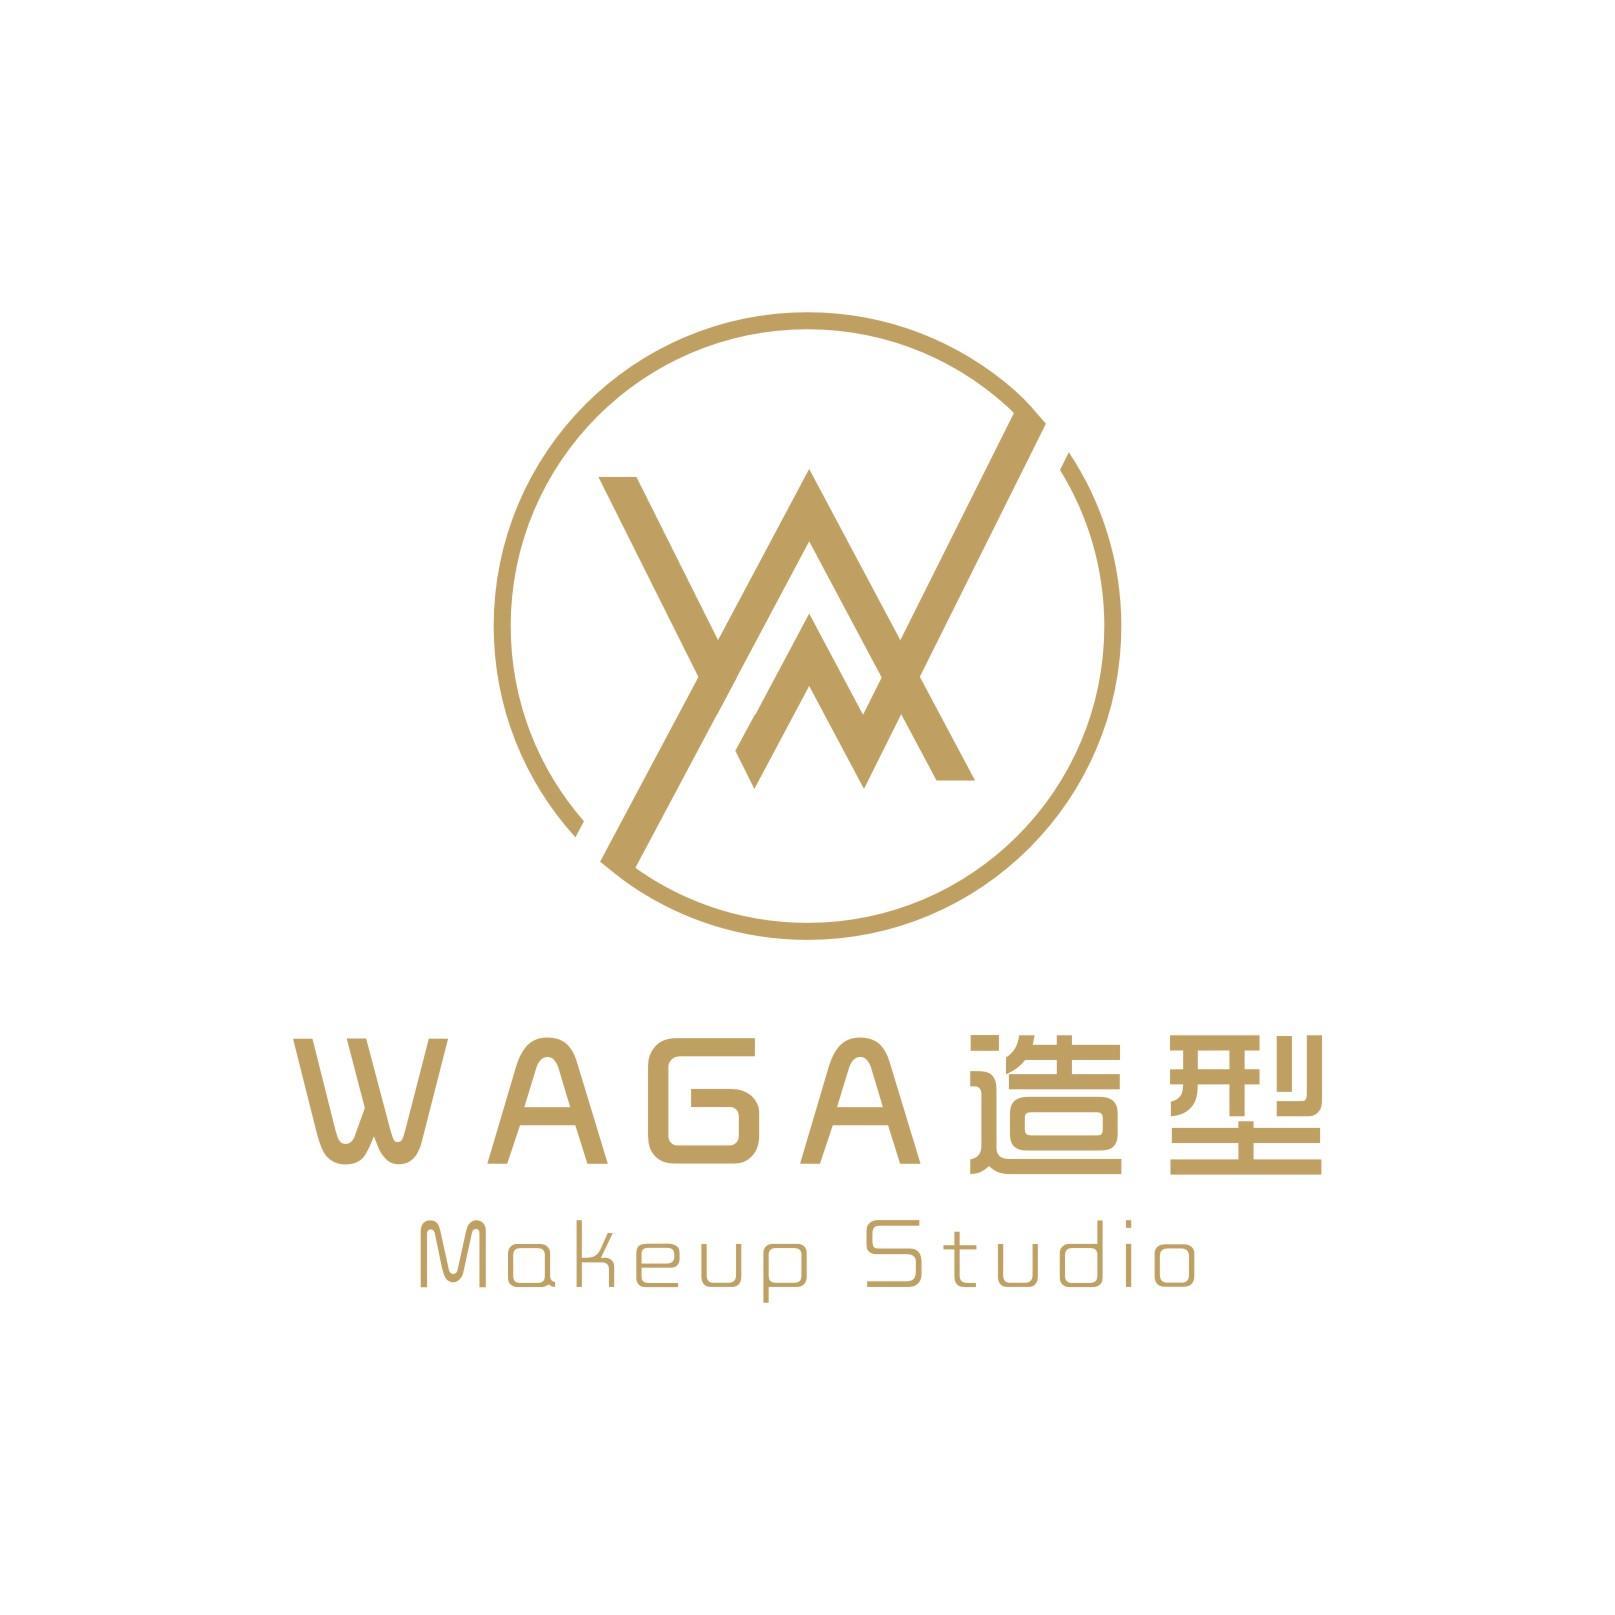 WAGA造型工作室旗舰店